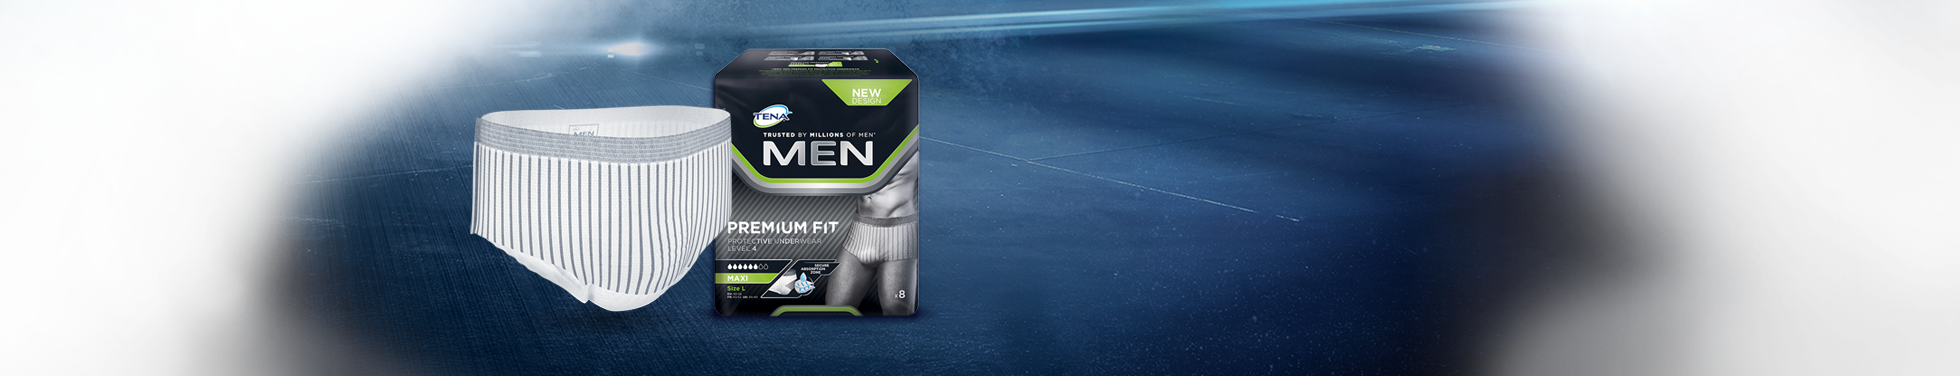 TENA Men Premium Fit Protective Underwear.png